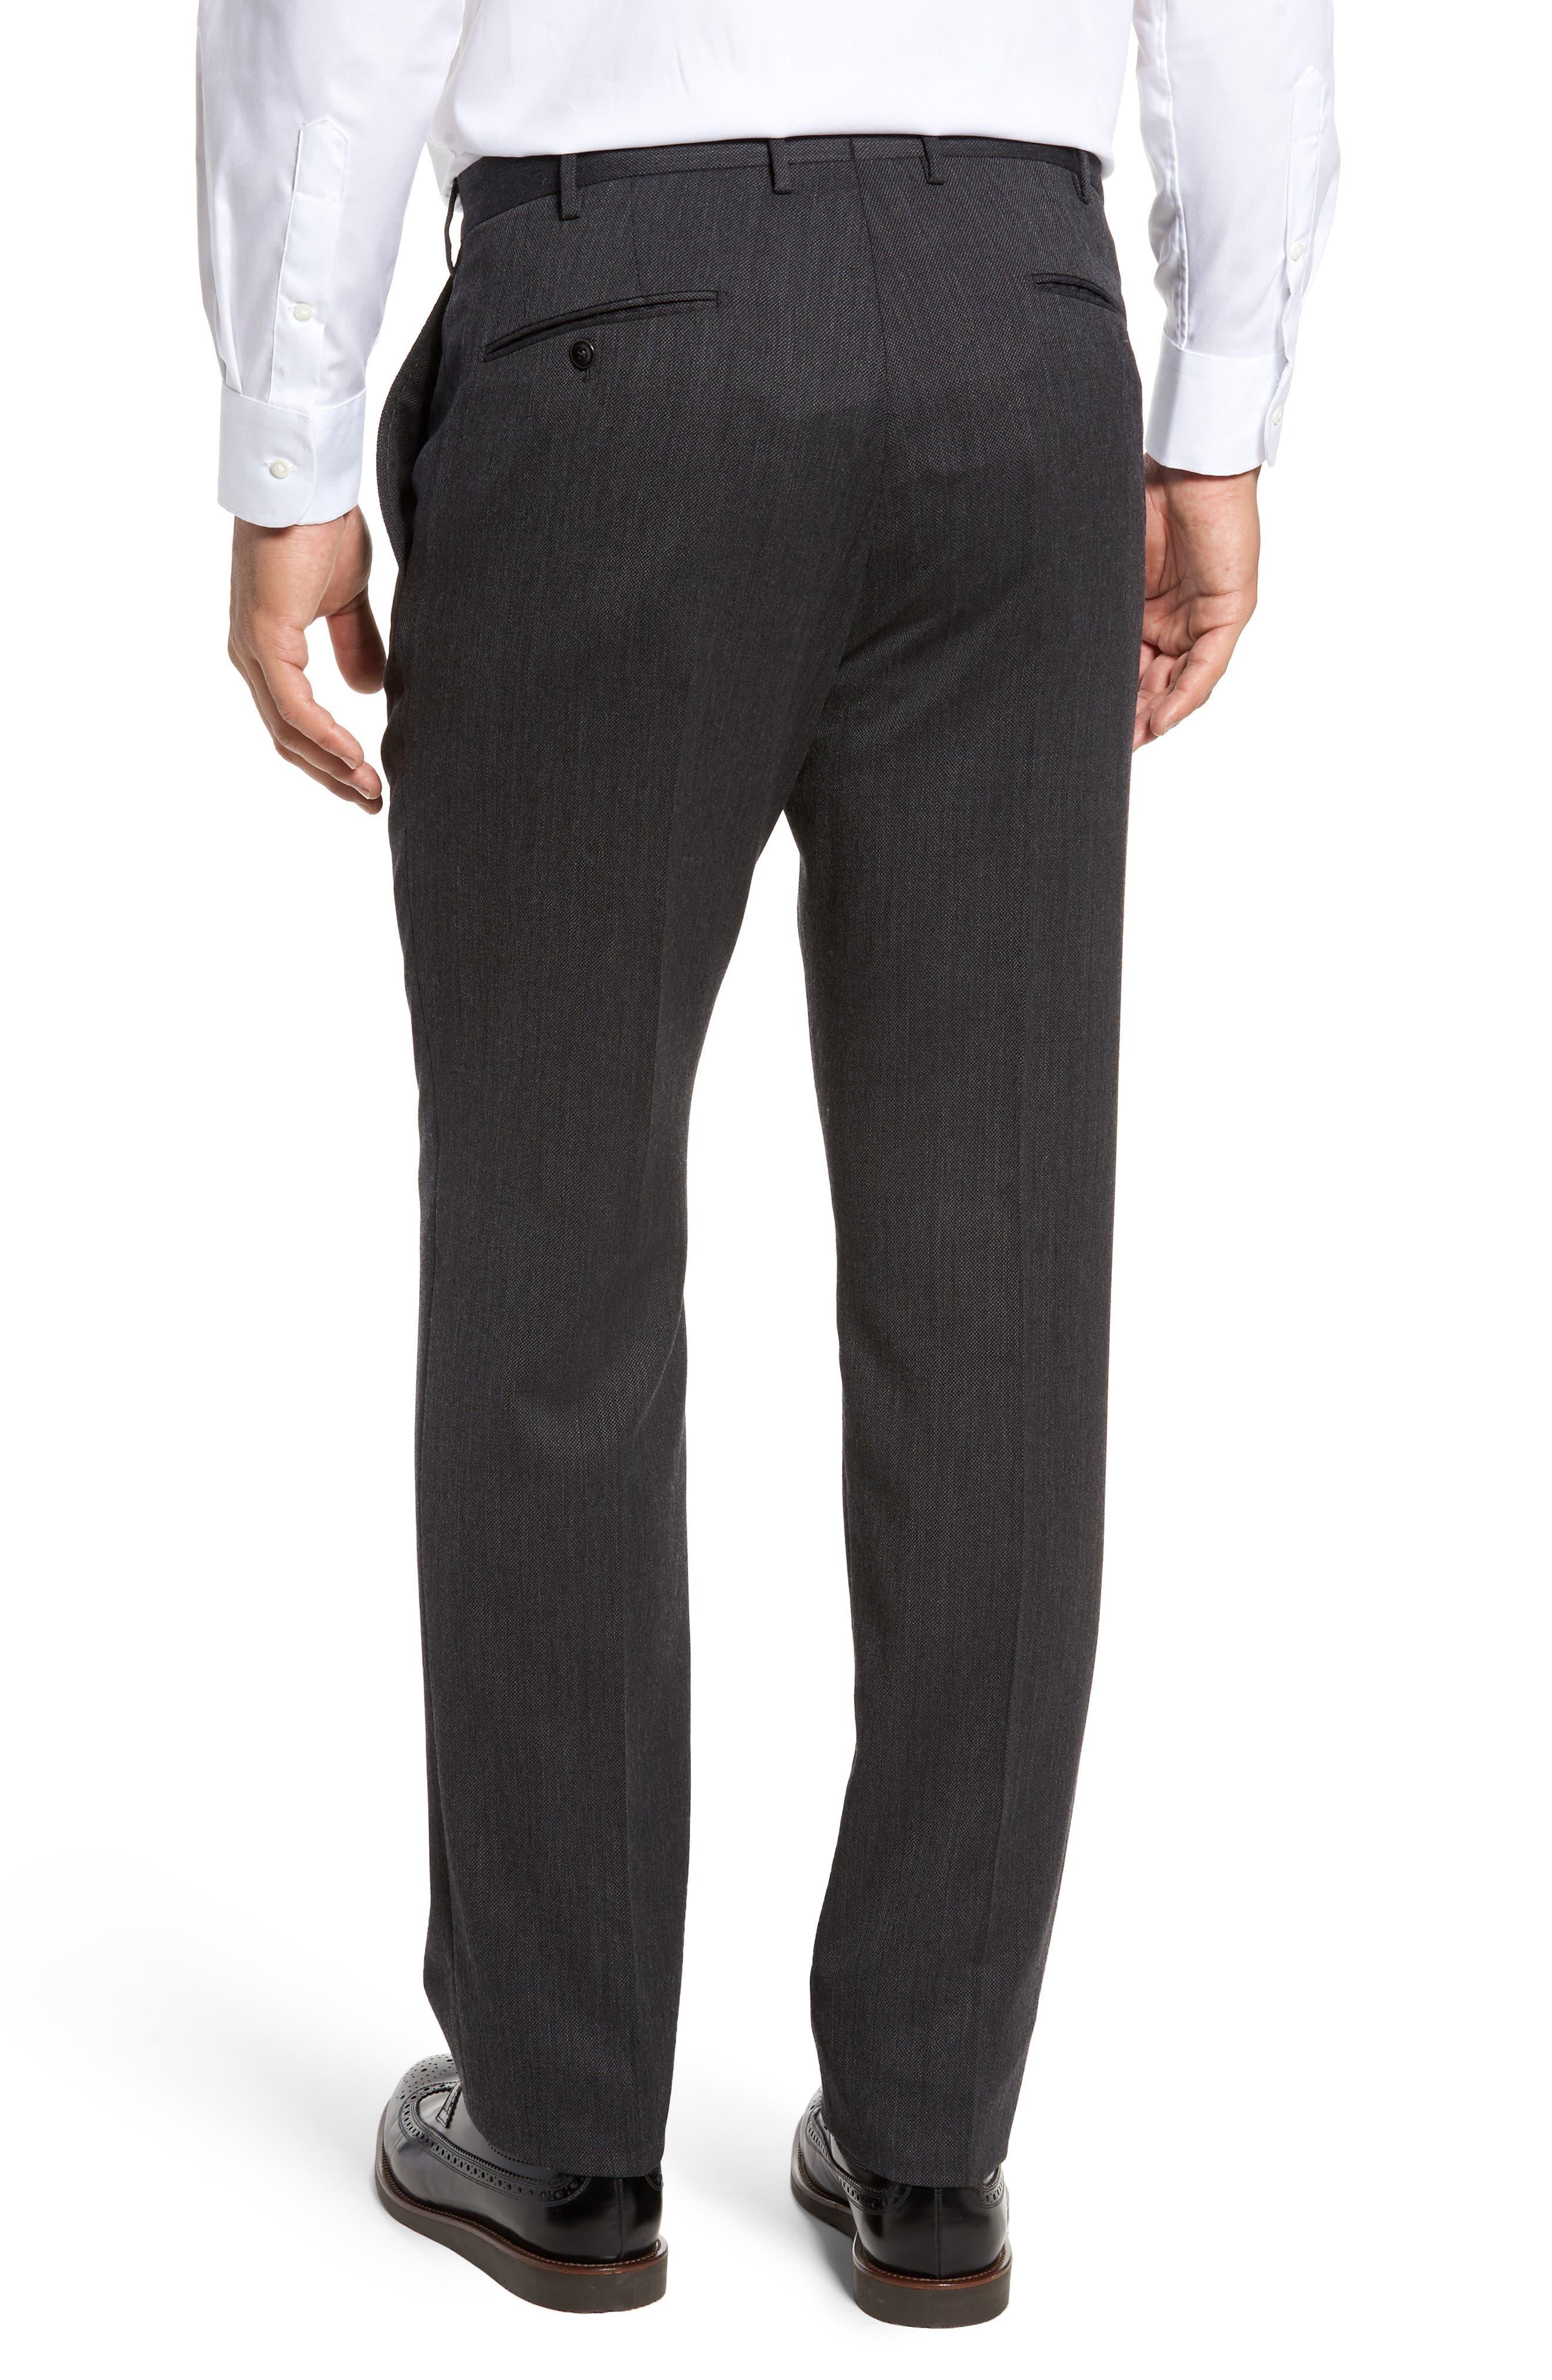 Benson Flat Front Wool Blend Trousers,                             Alternate thumbnail 3, color,                             025